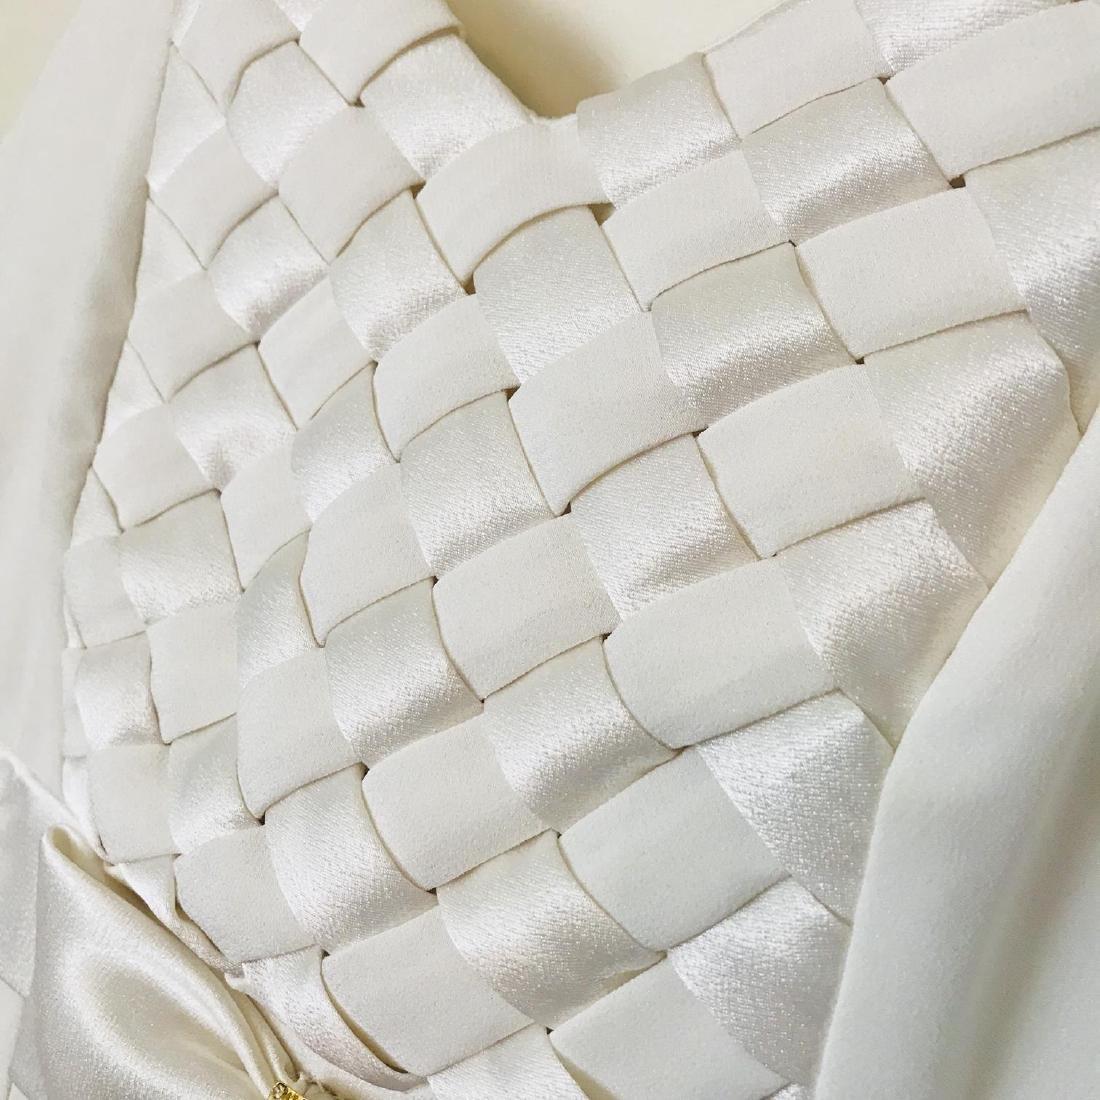 Vintage Women's White Designer Dress Size US 8 EUR 38 - 6